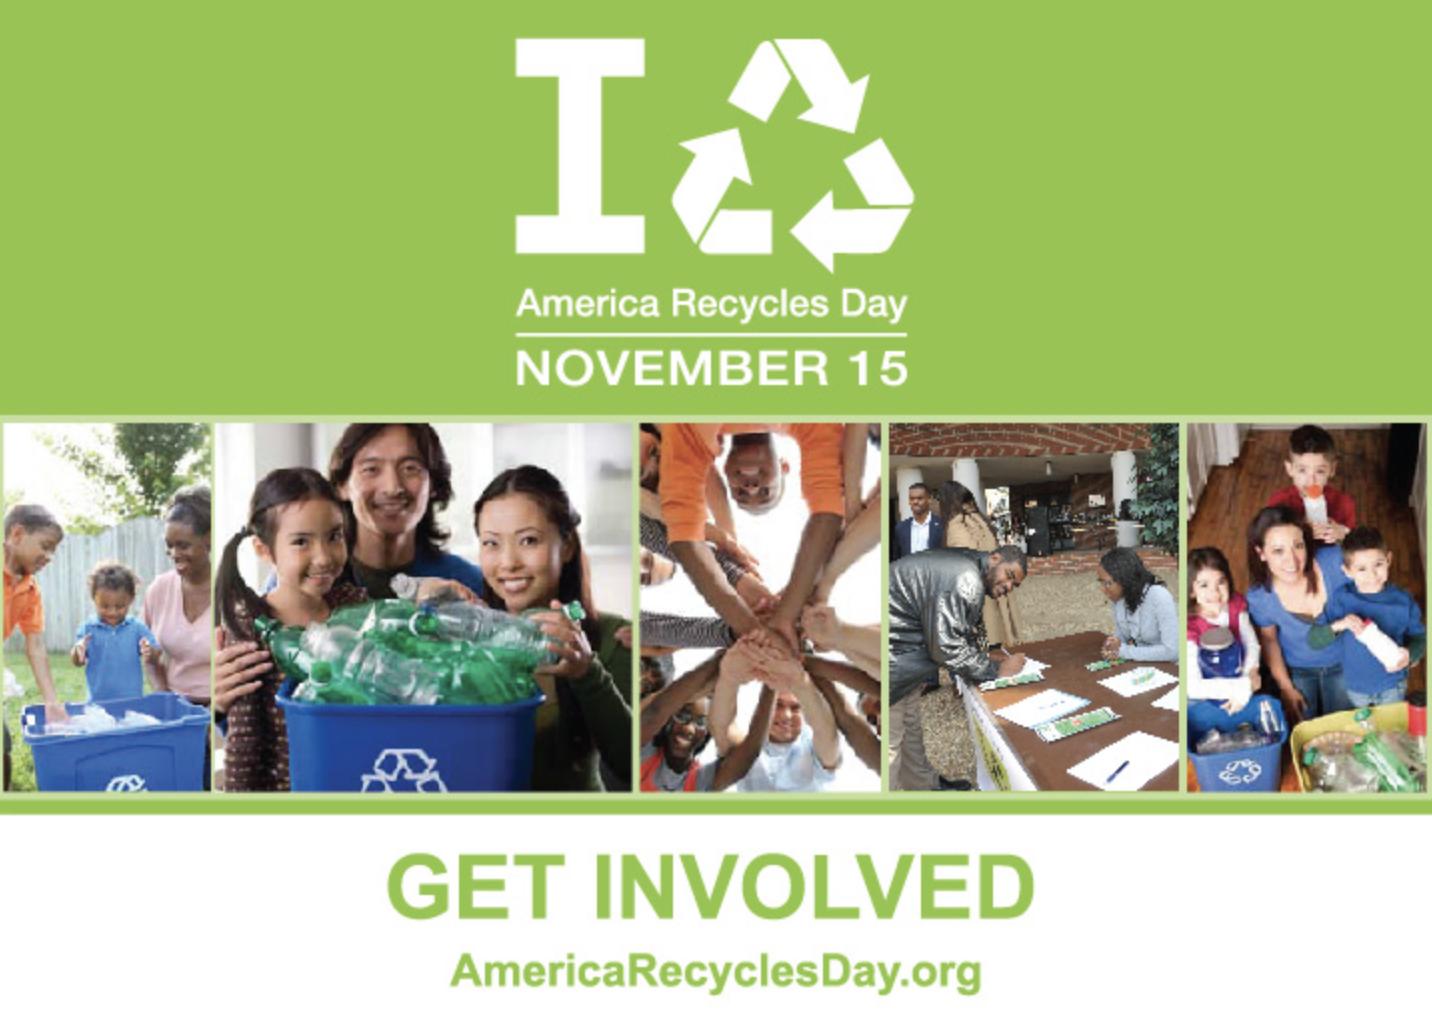 pratt-industries-america-recycles-day